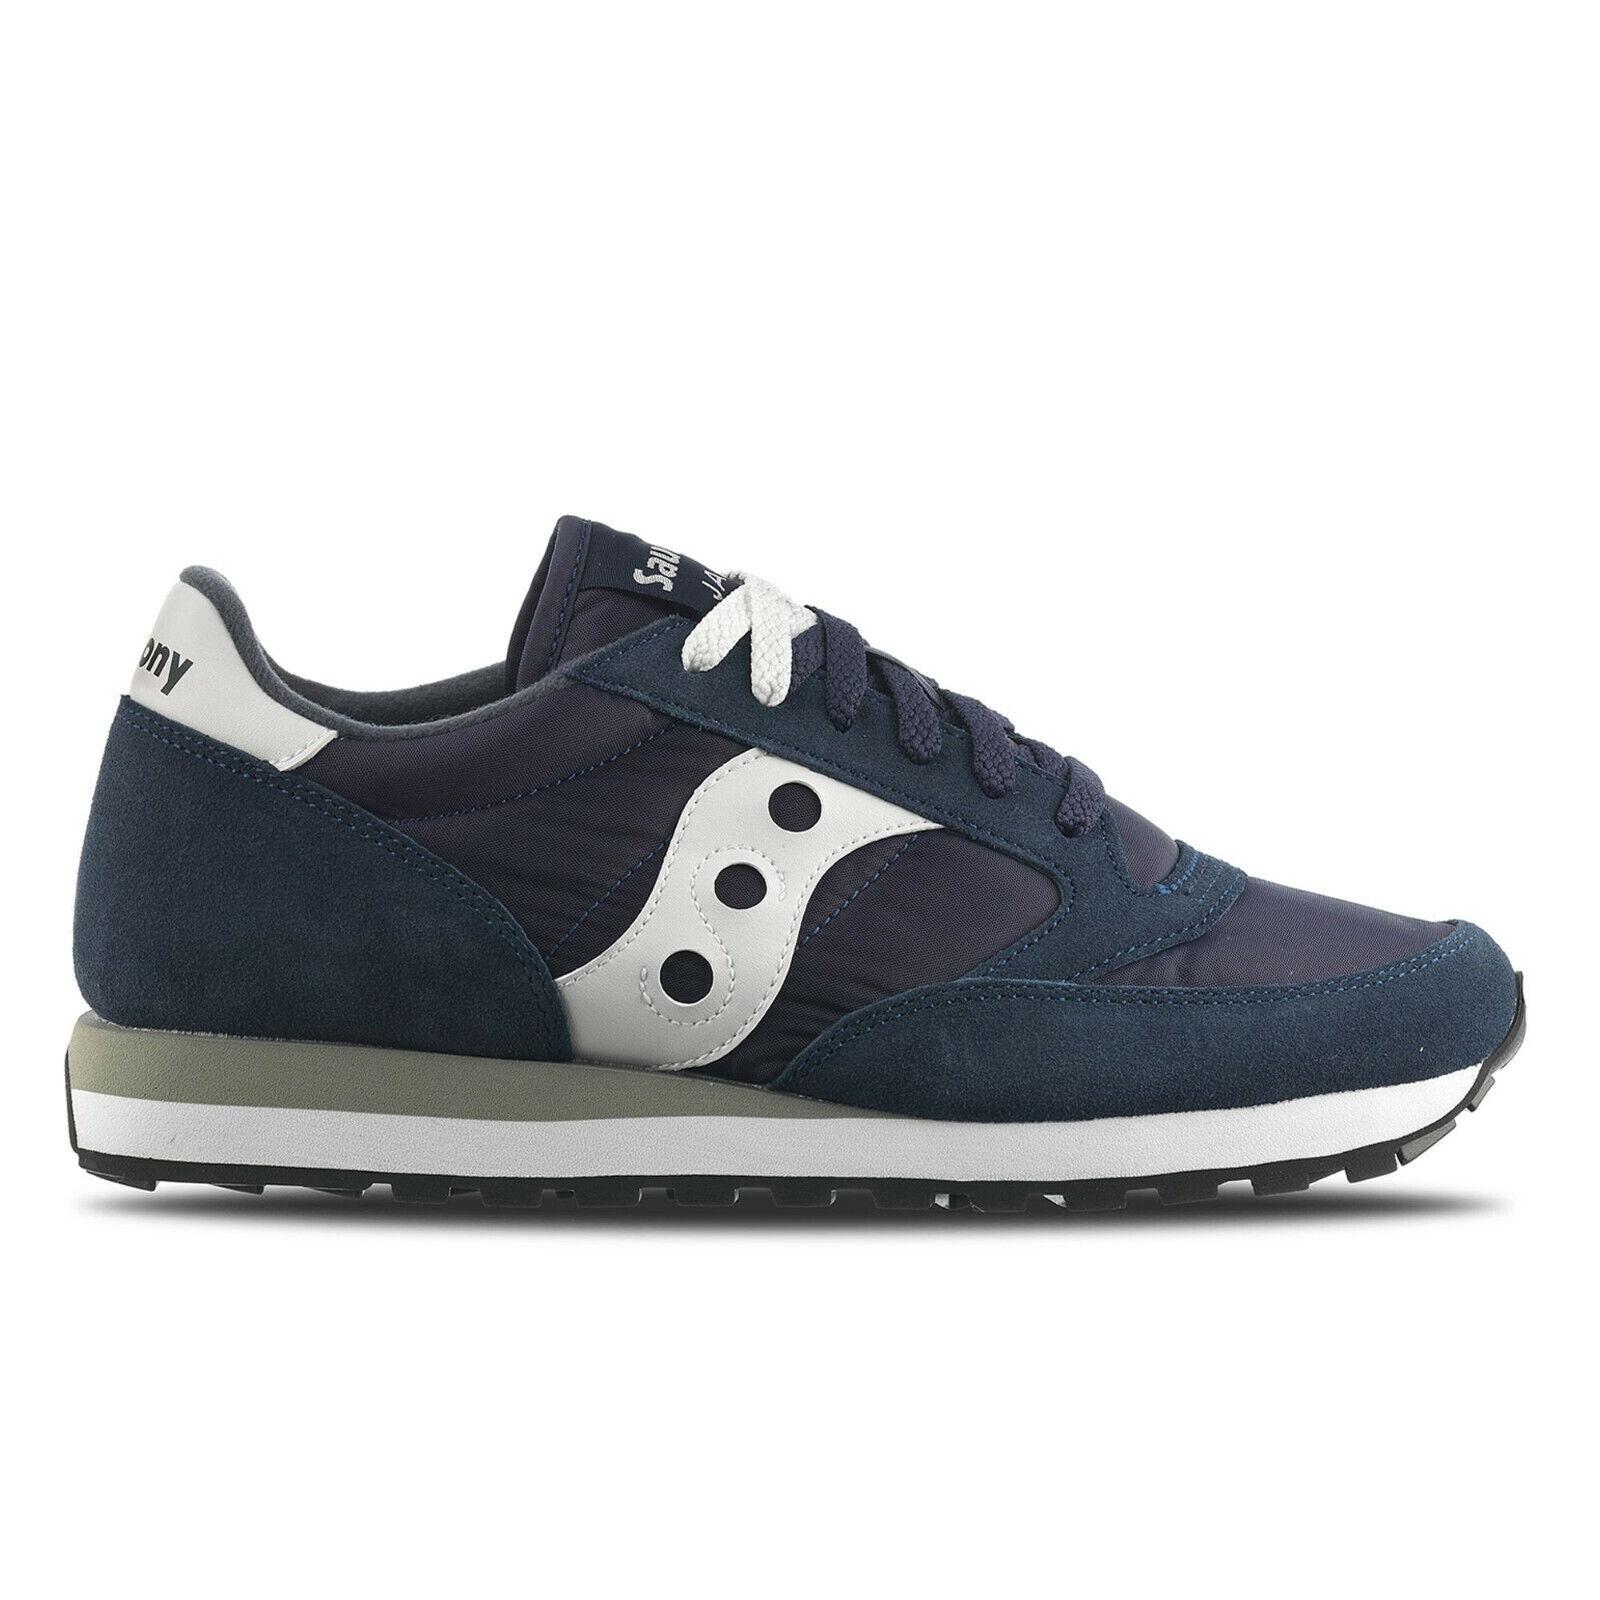 SAUCONY JAZZ ORIGINAL men women shoes blue SNEAKERS LEGGERA COMODA S1044-316